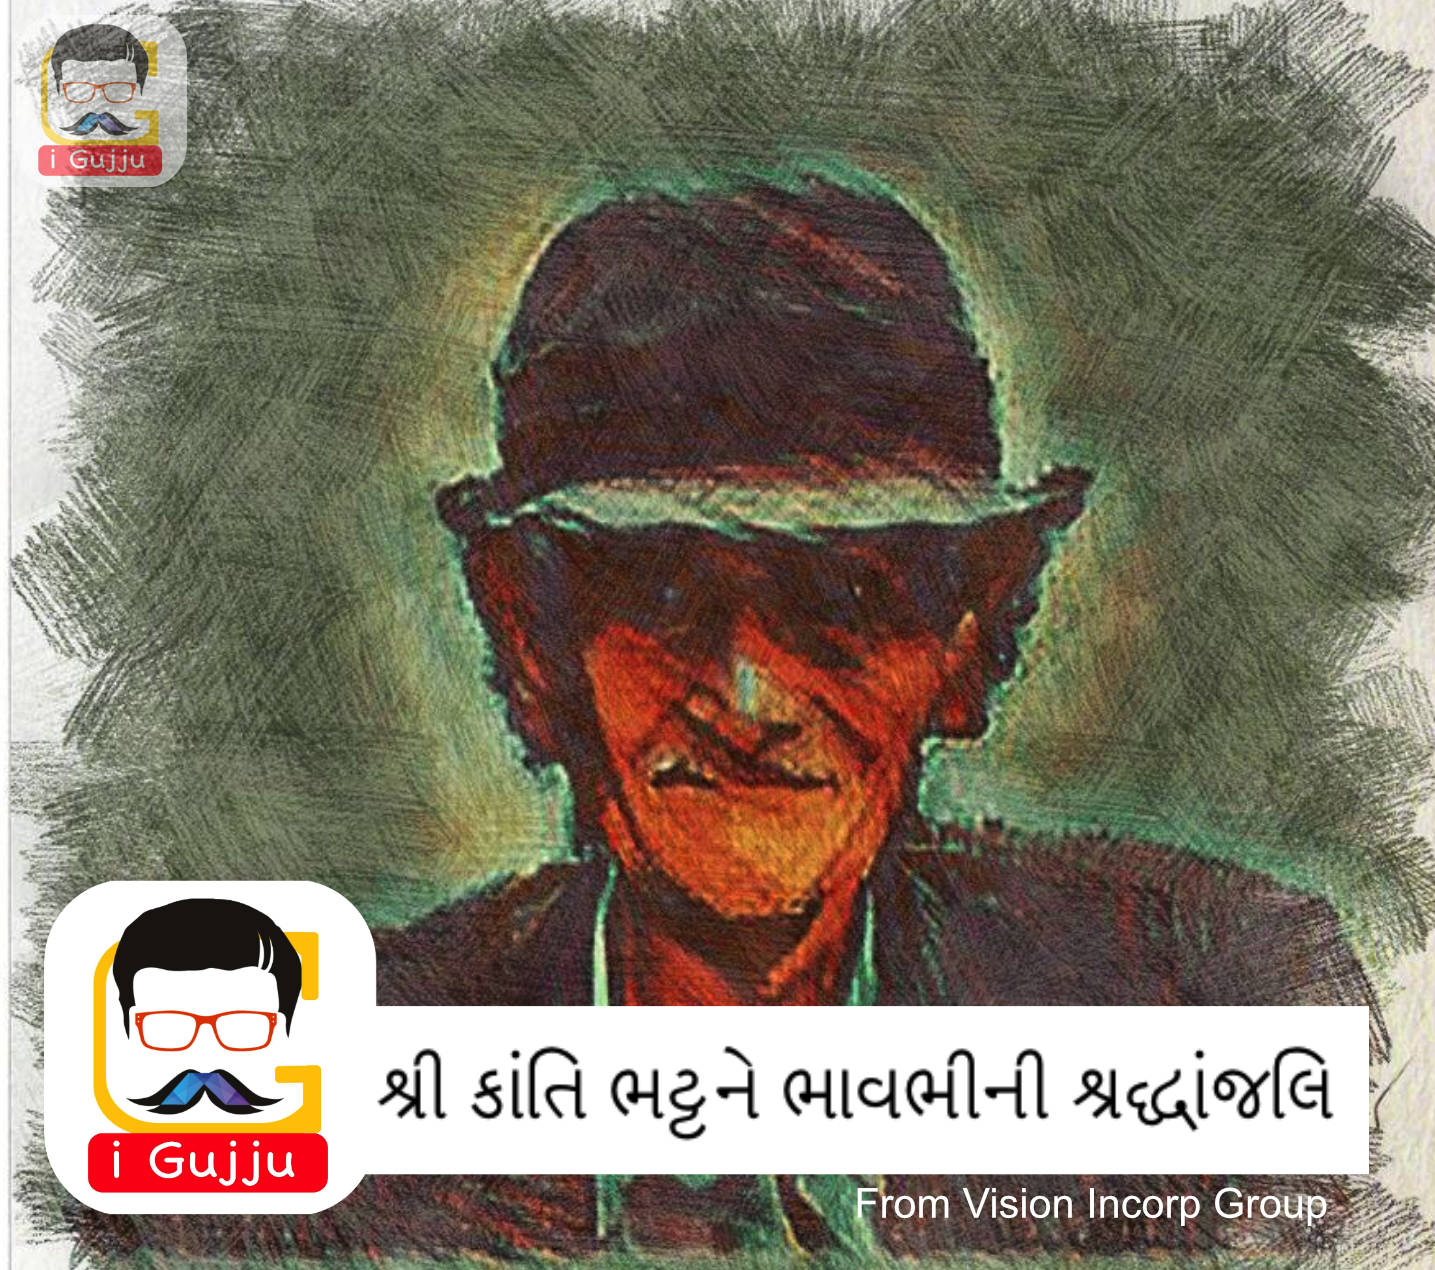 Kanti Bhatt